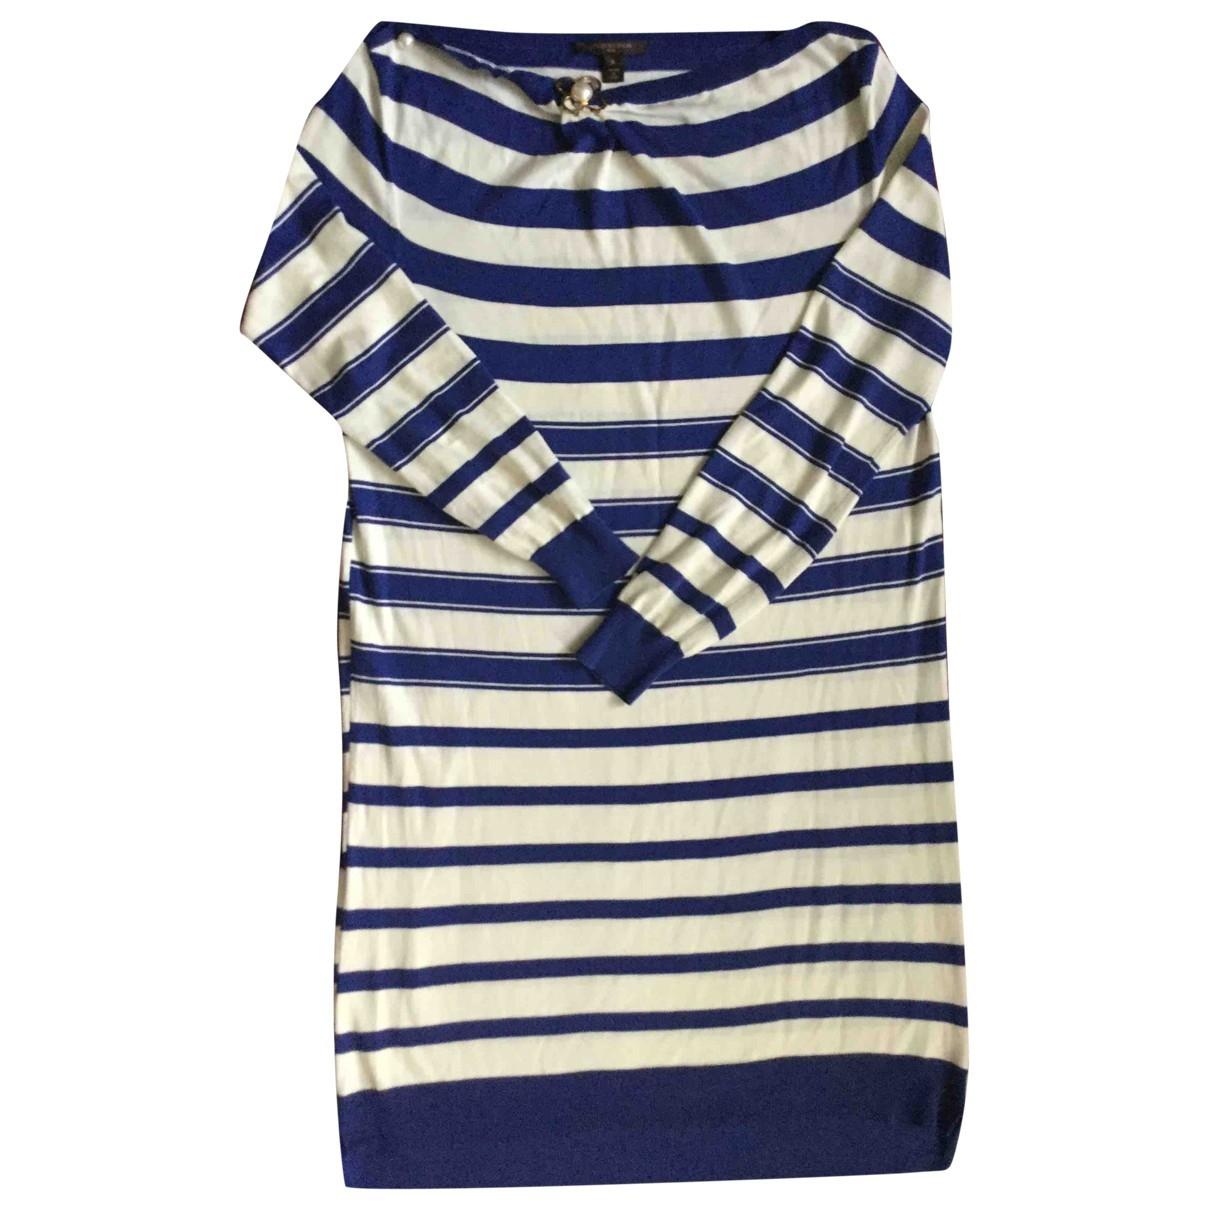 Louis Vuitton \N Multicolour Cotton dress for Women XS International